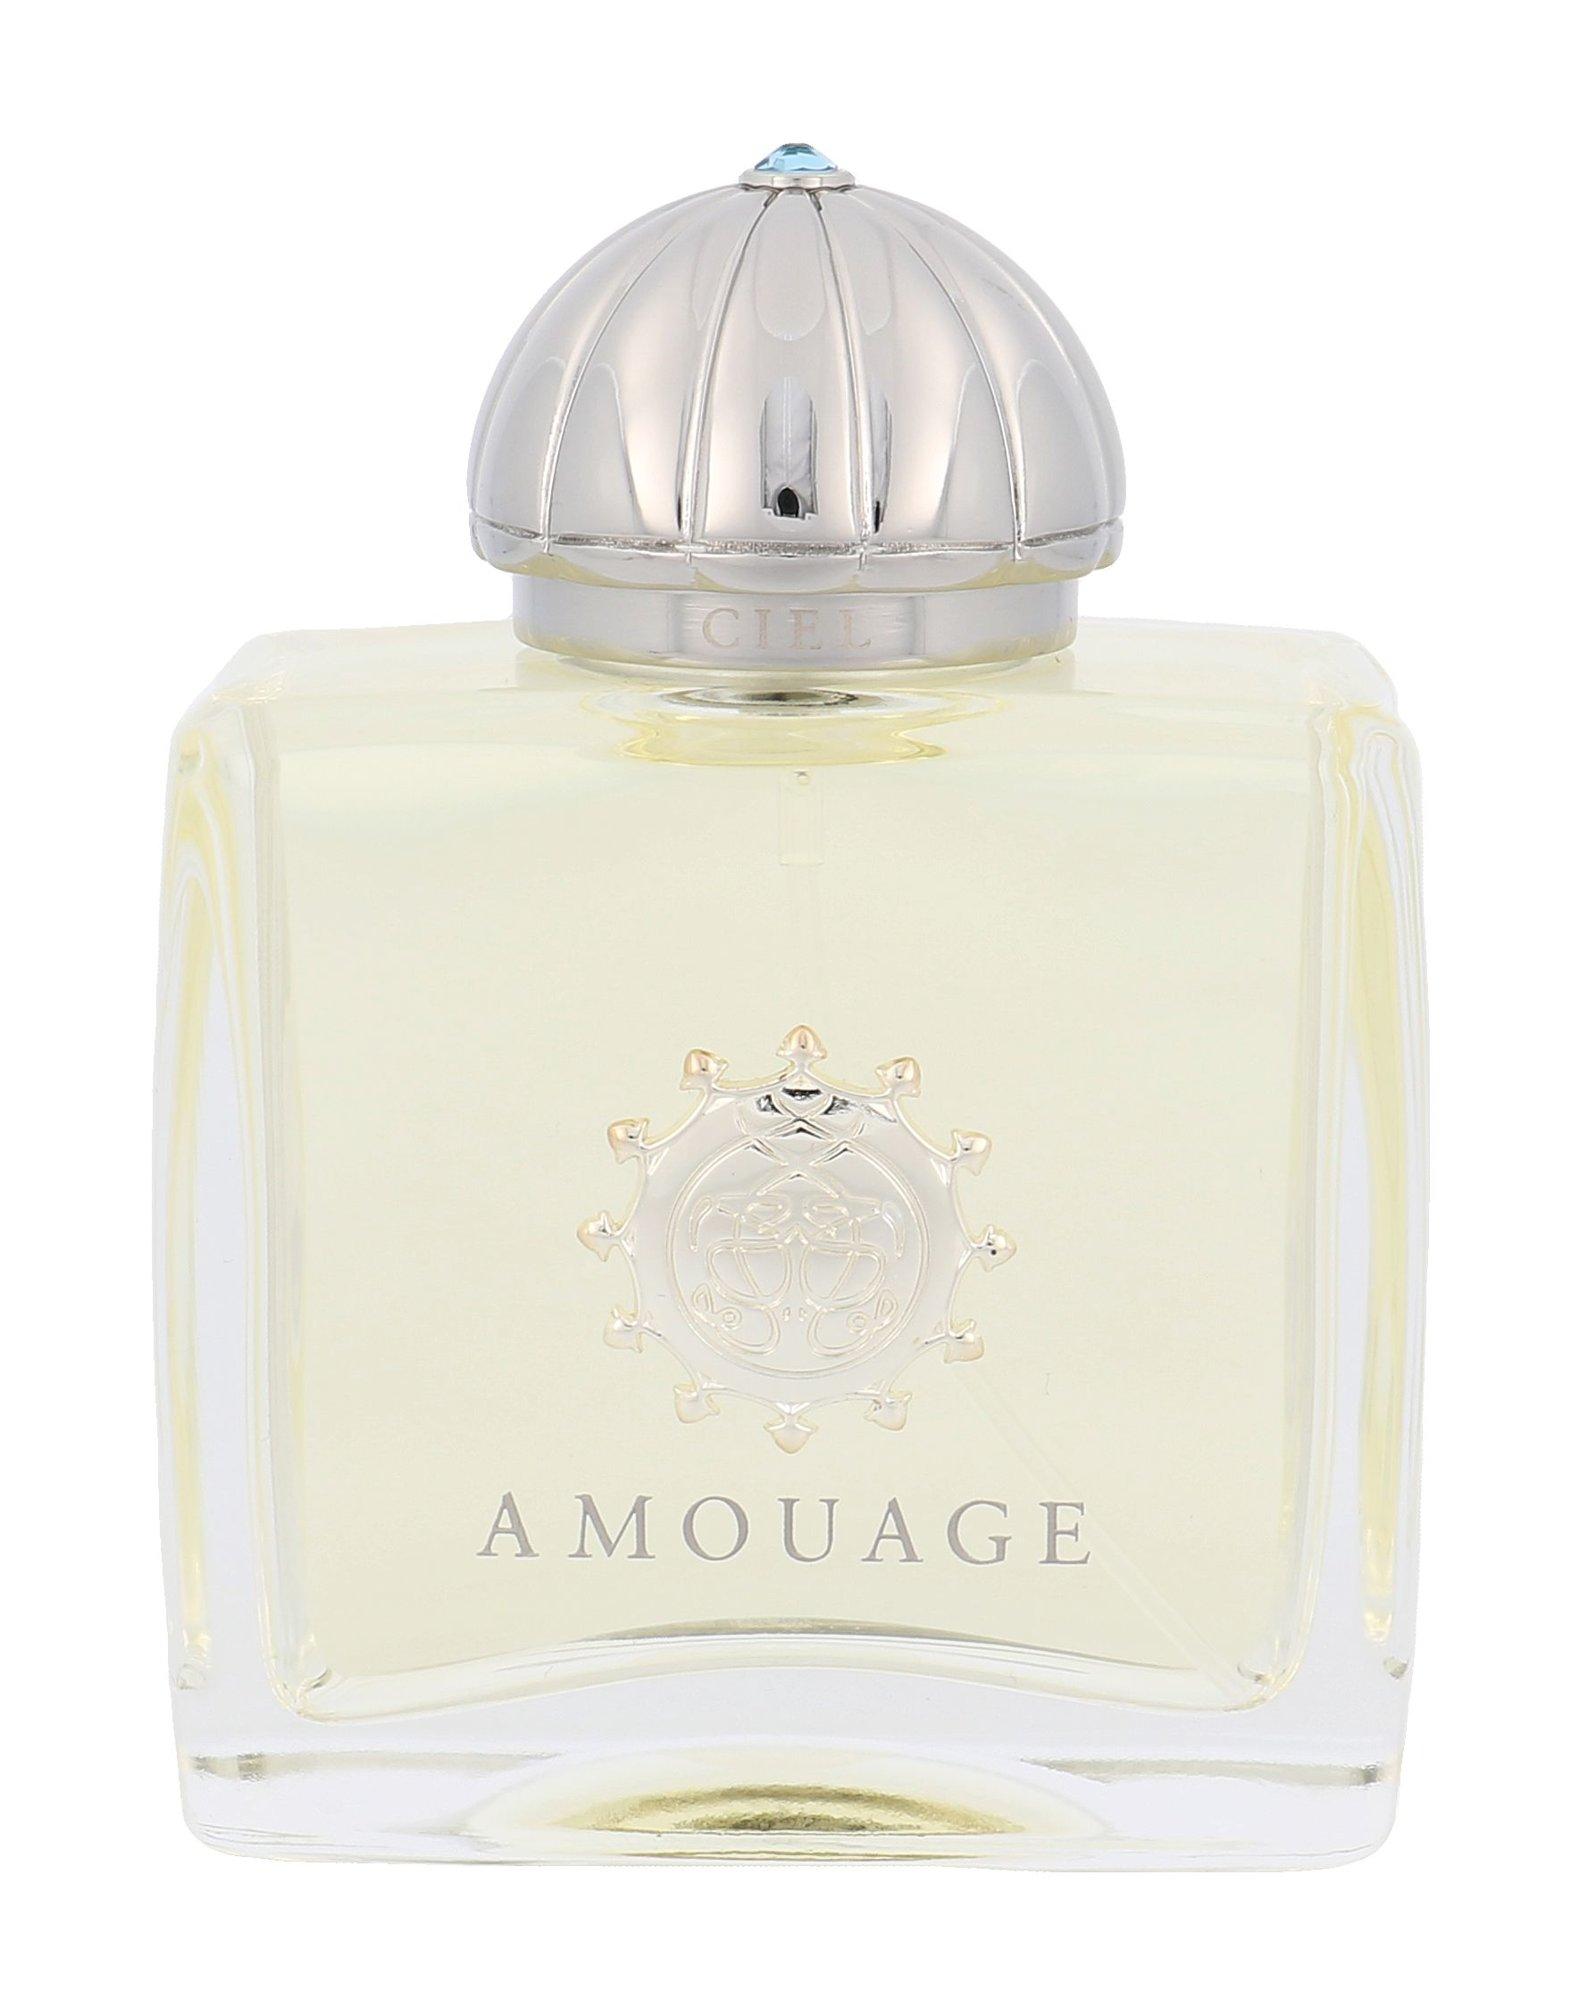 Amouage Ciel Woman EDP 100ml